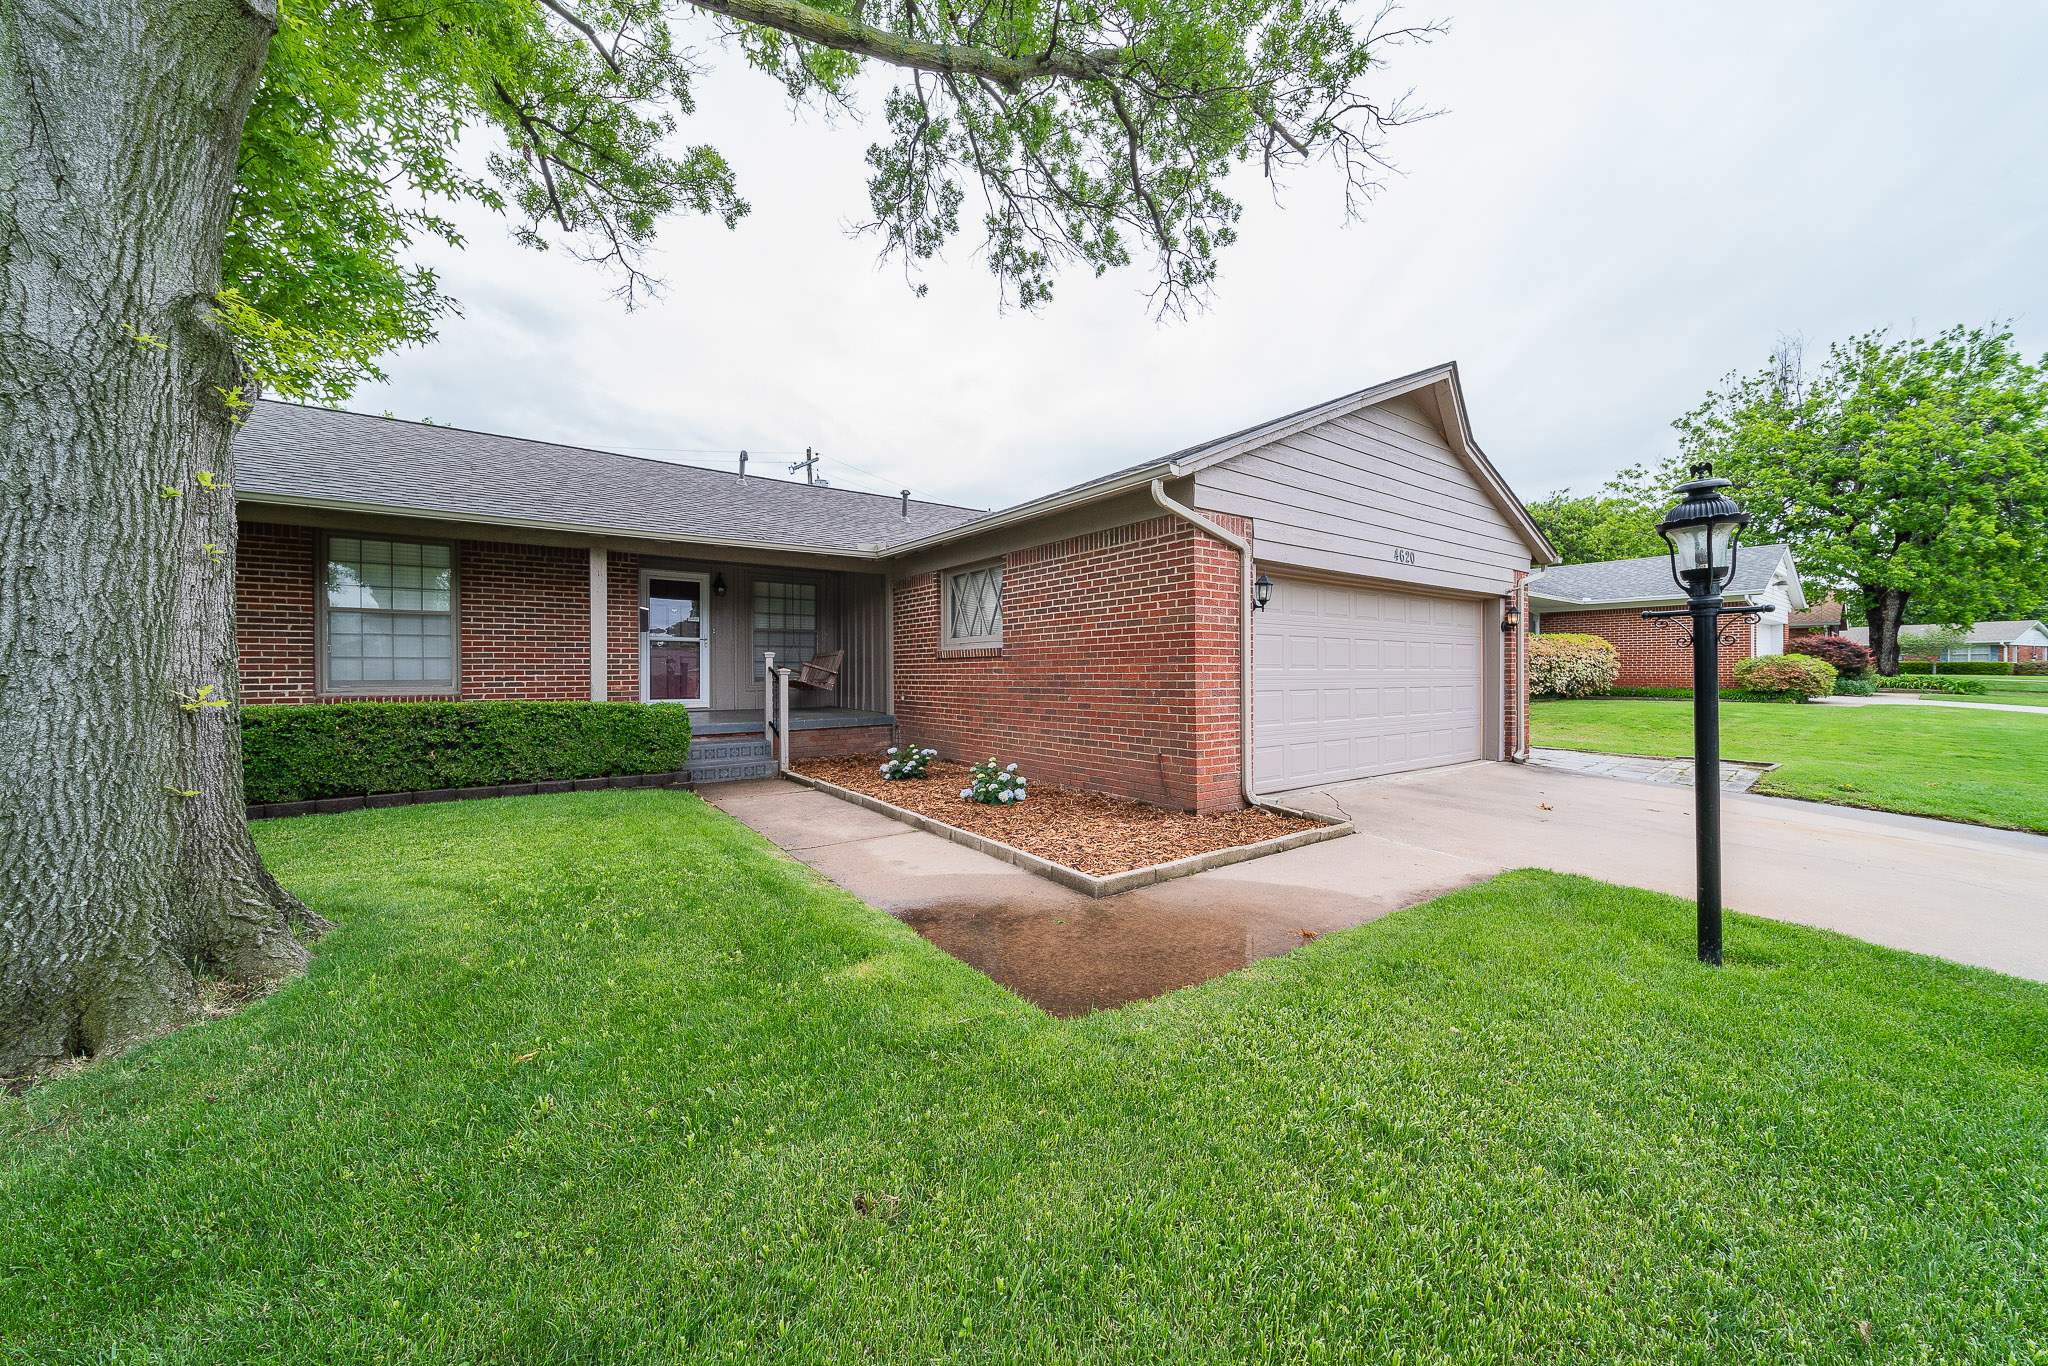 4620 E 57th St - Tulsa - $187,500